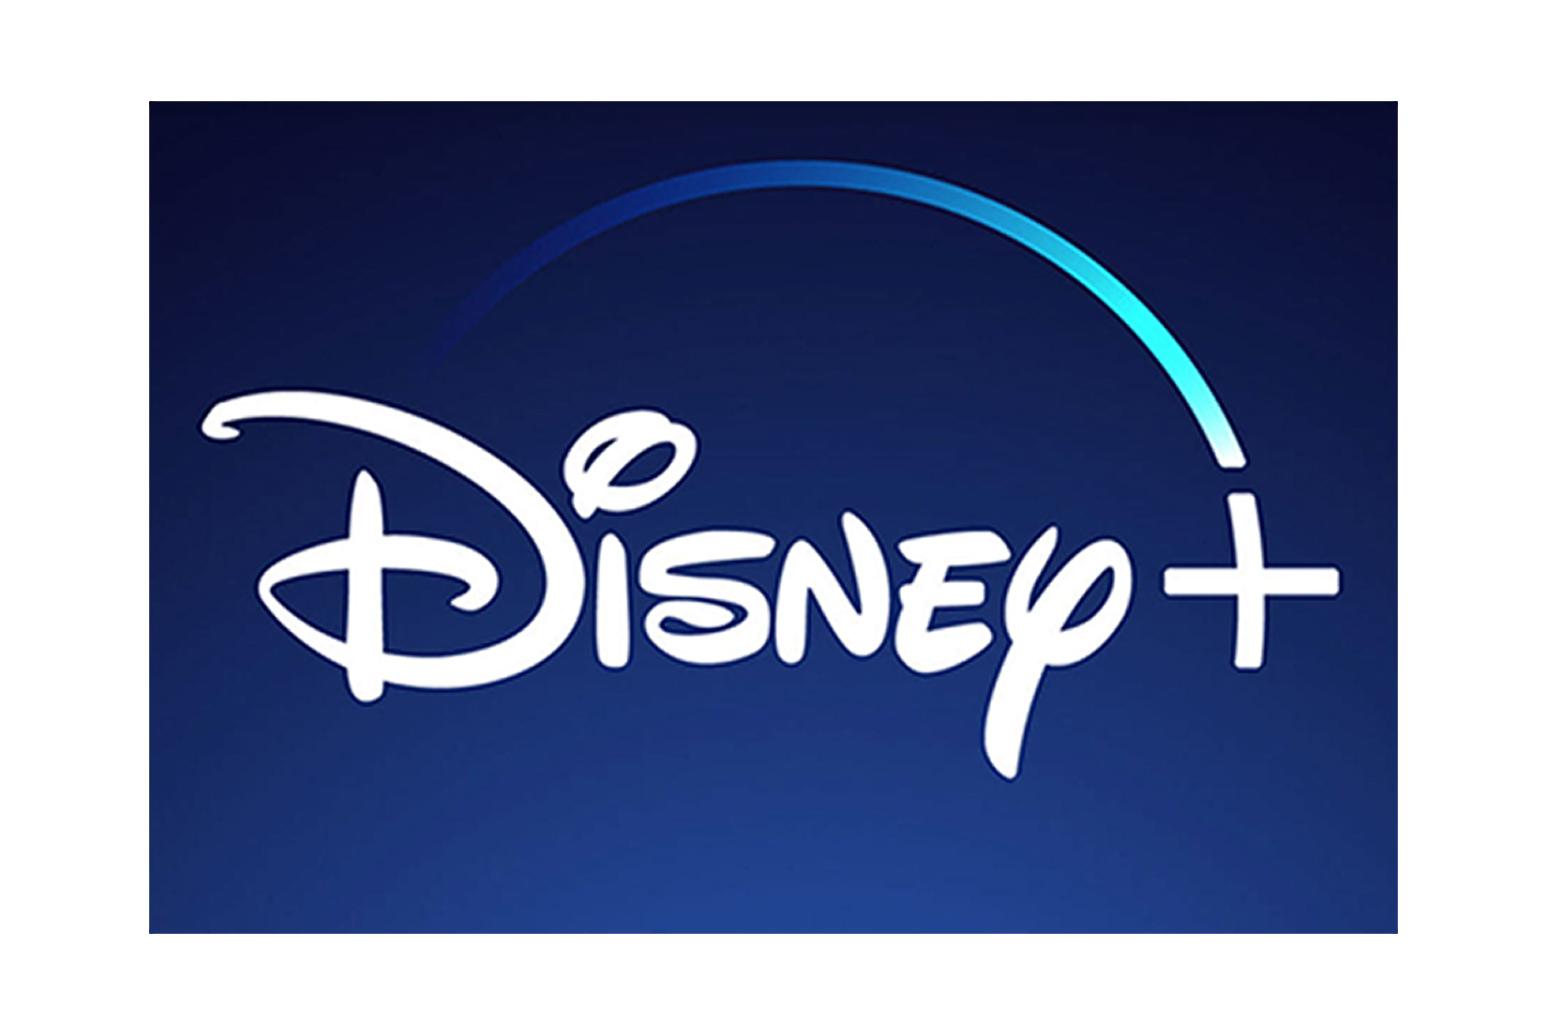 disney-plus-logo.jpg